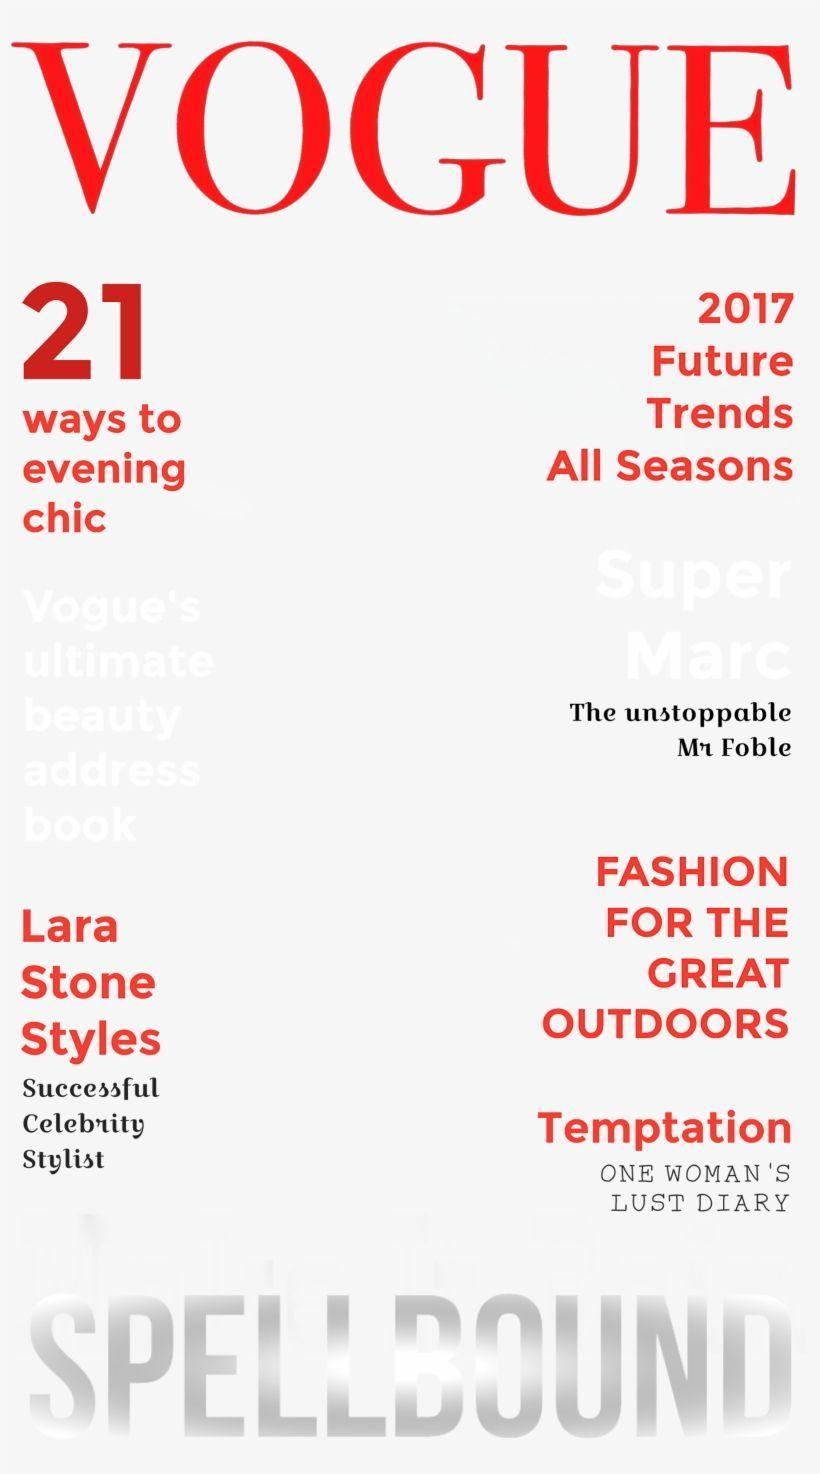 001 Imposing Fake Magazine Cover Template Photoshop Concept  TimeFull